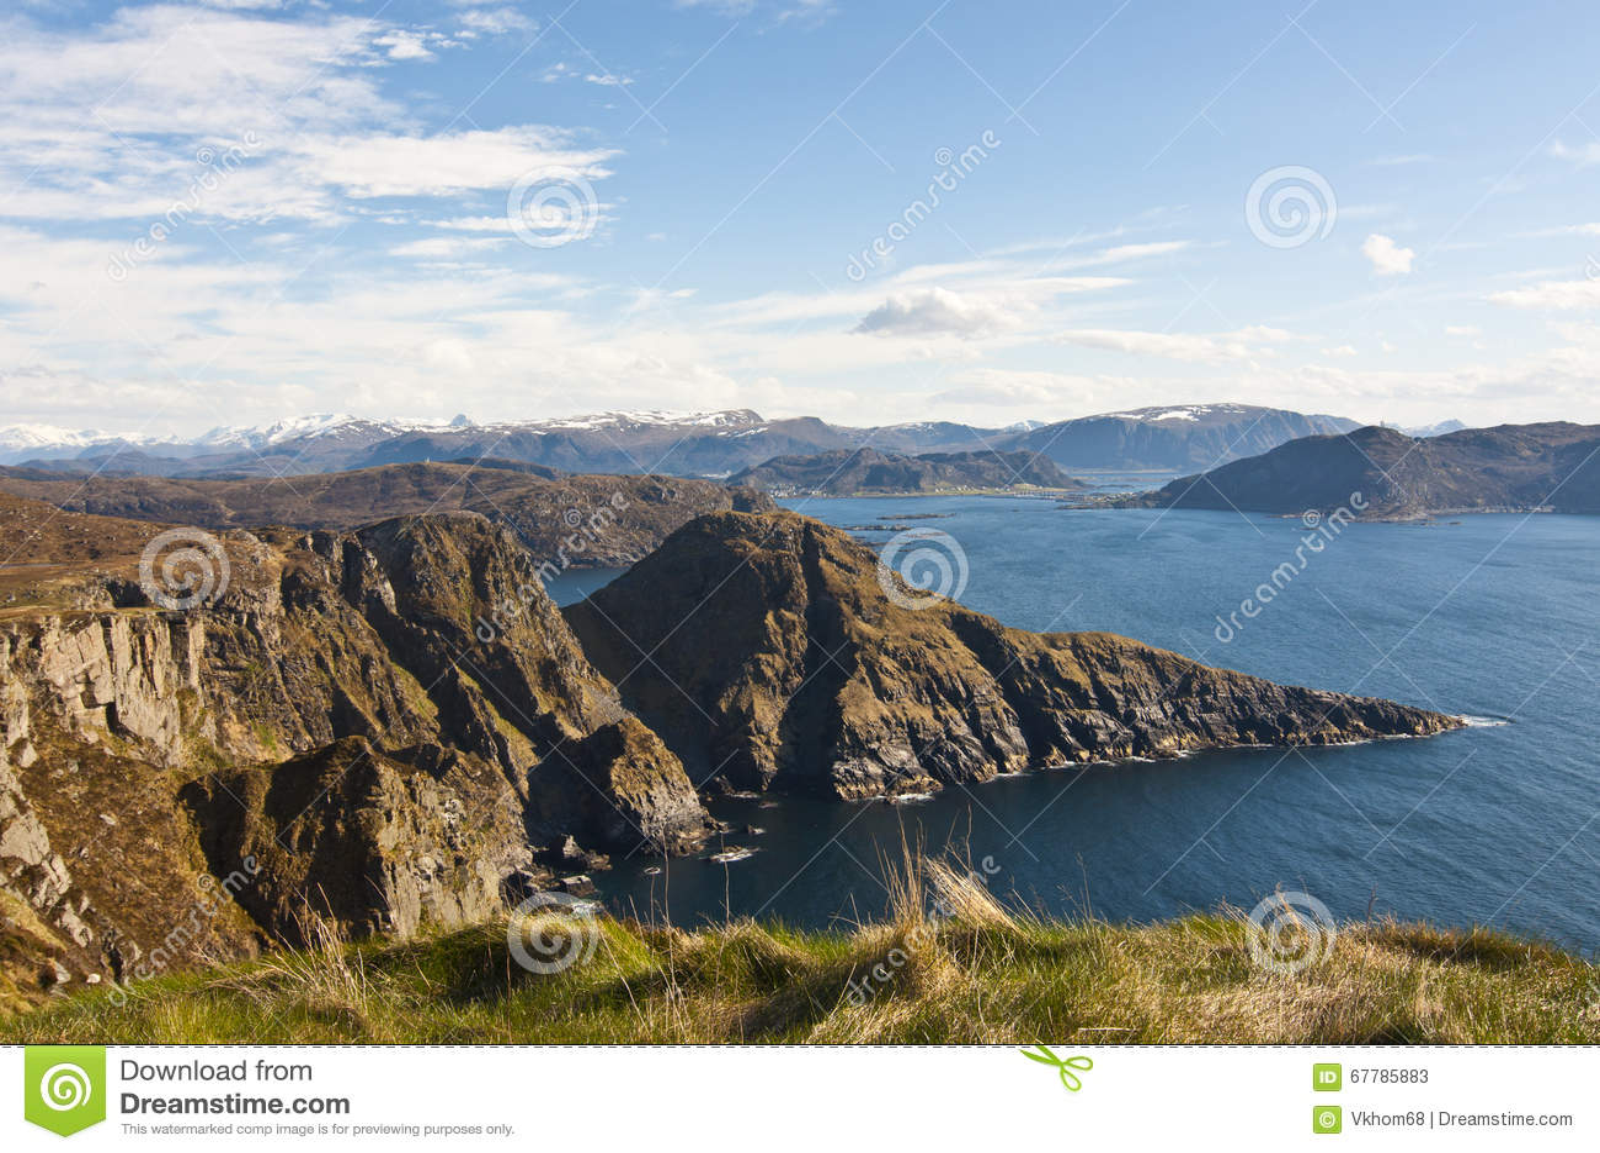 Norwegen Insel Runde Stockbild Bild Von Insel Reiseflug 67785883